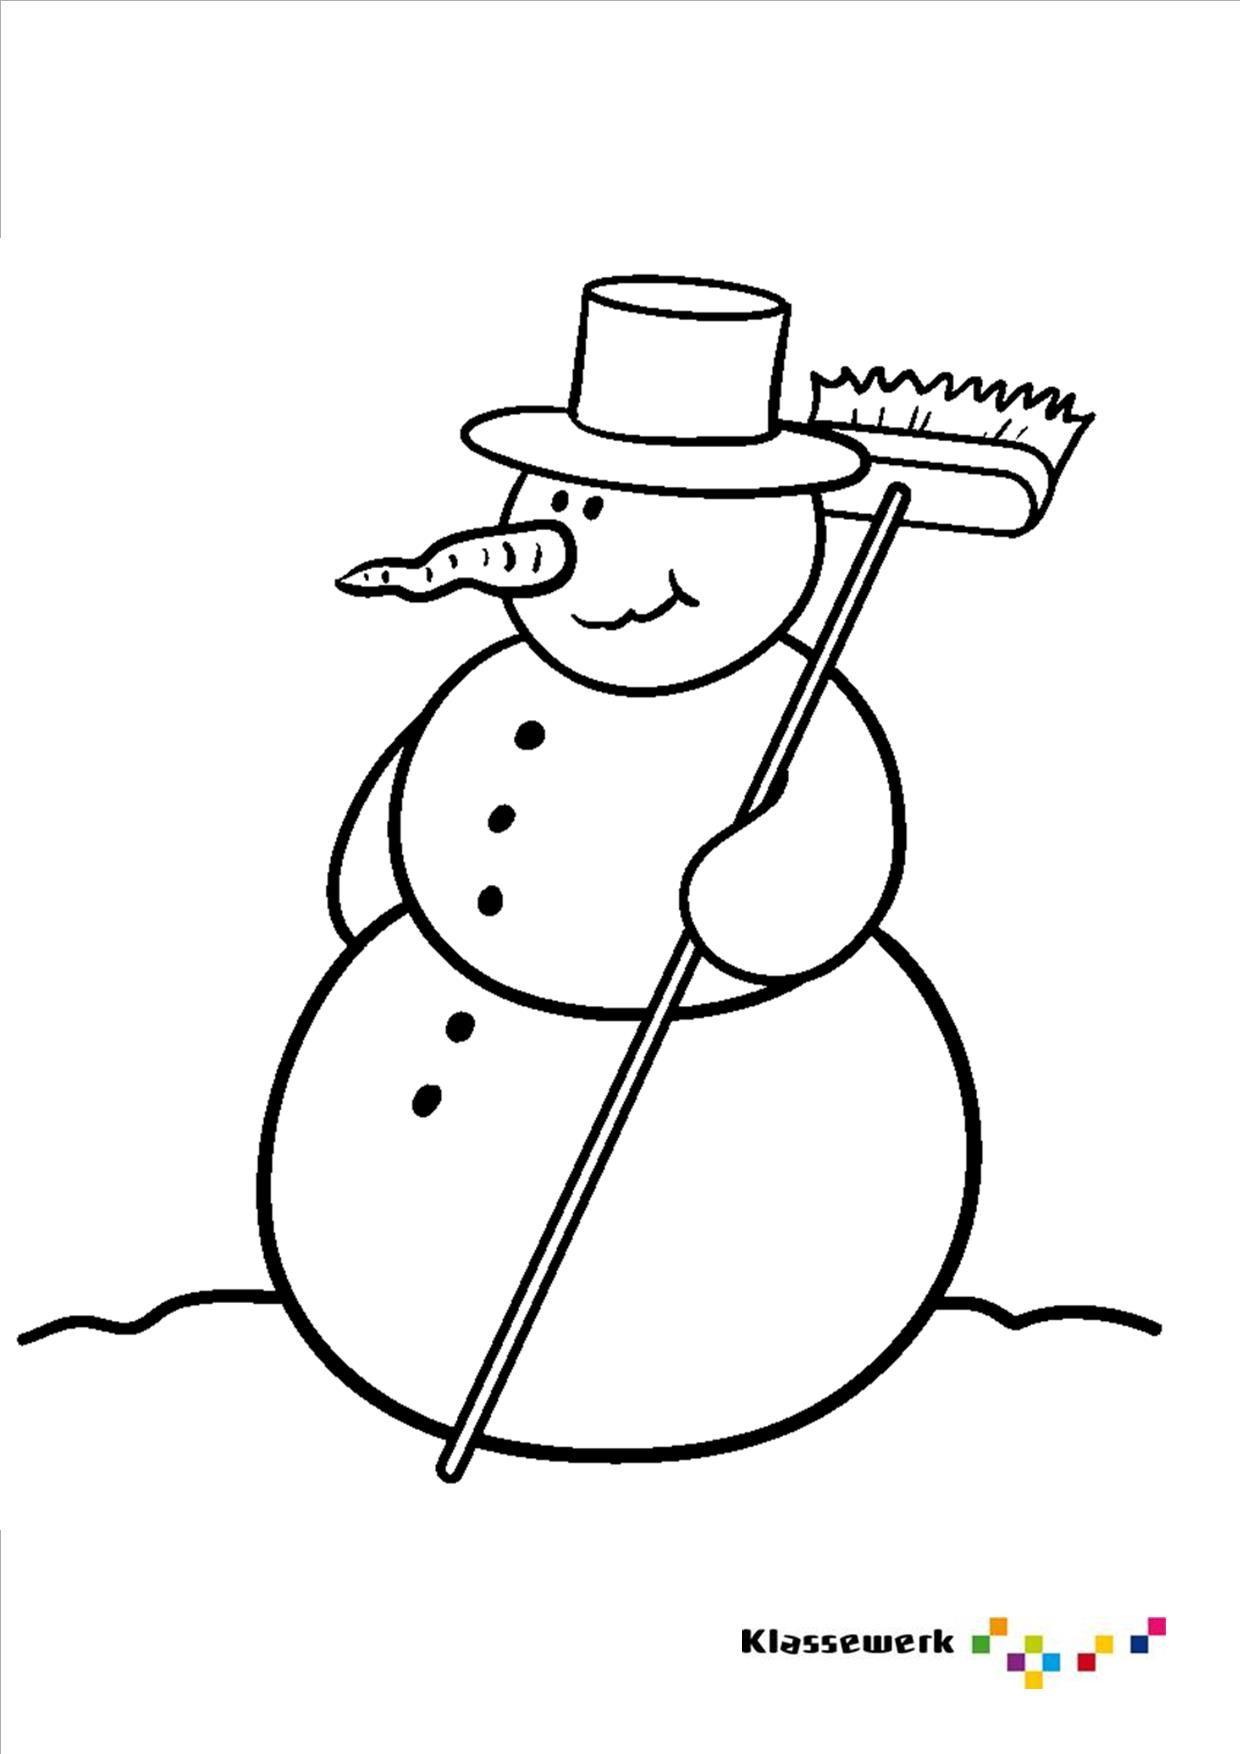 kleurplaat olaf sneeuwpop malvorlagen fur kinder